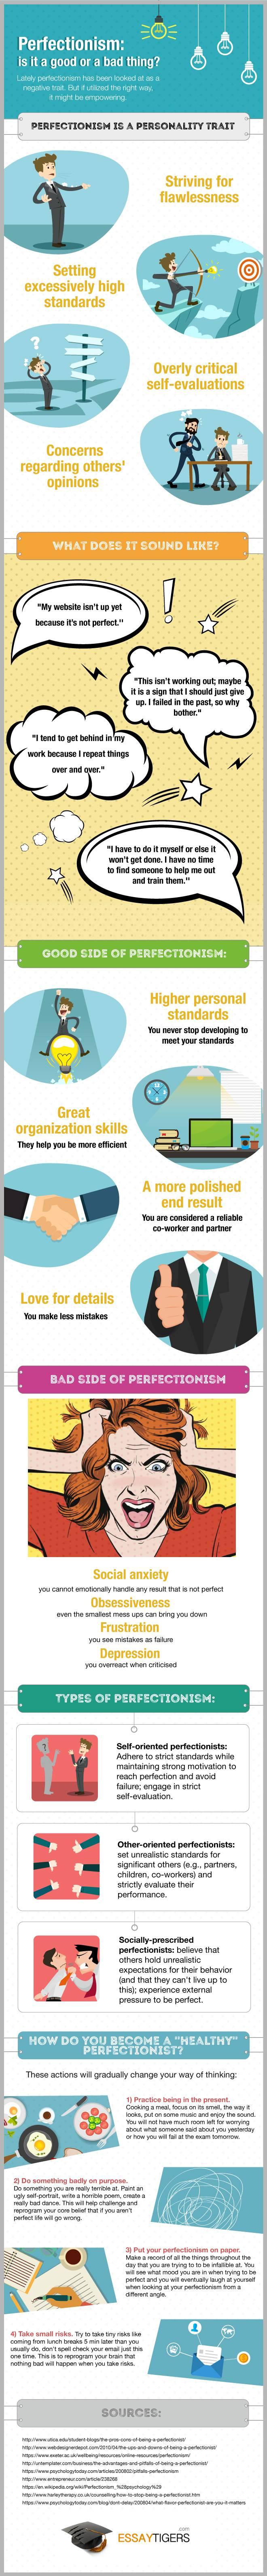 perfectionism infographic